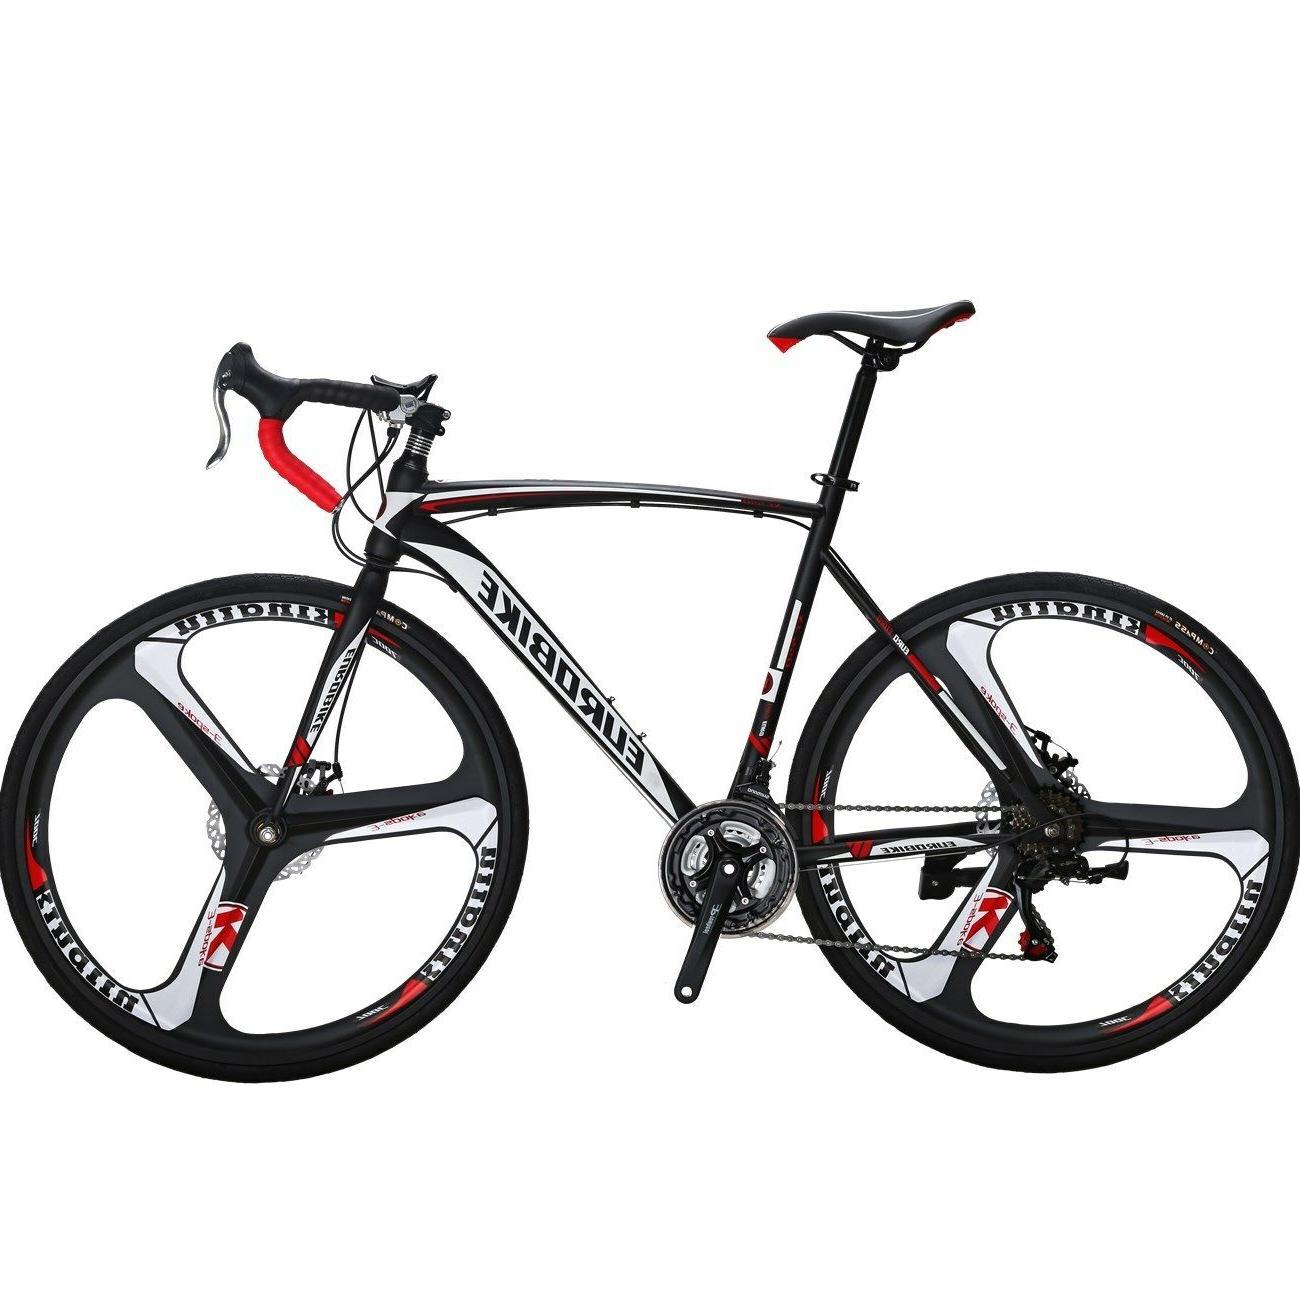 2018 road bike shimano 21 speed disc